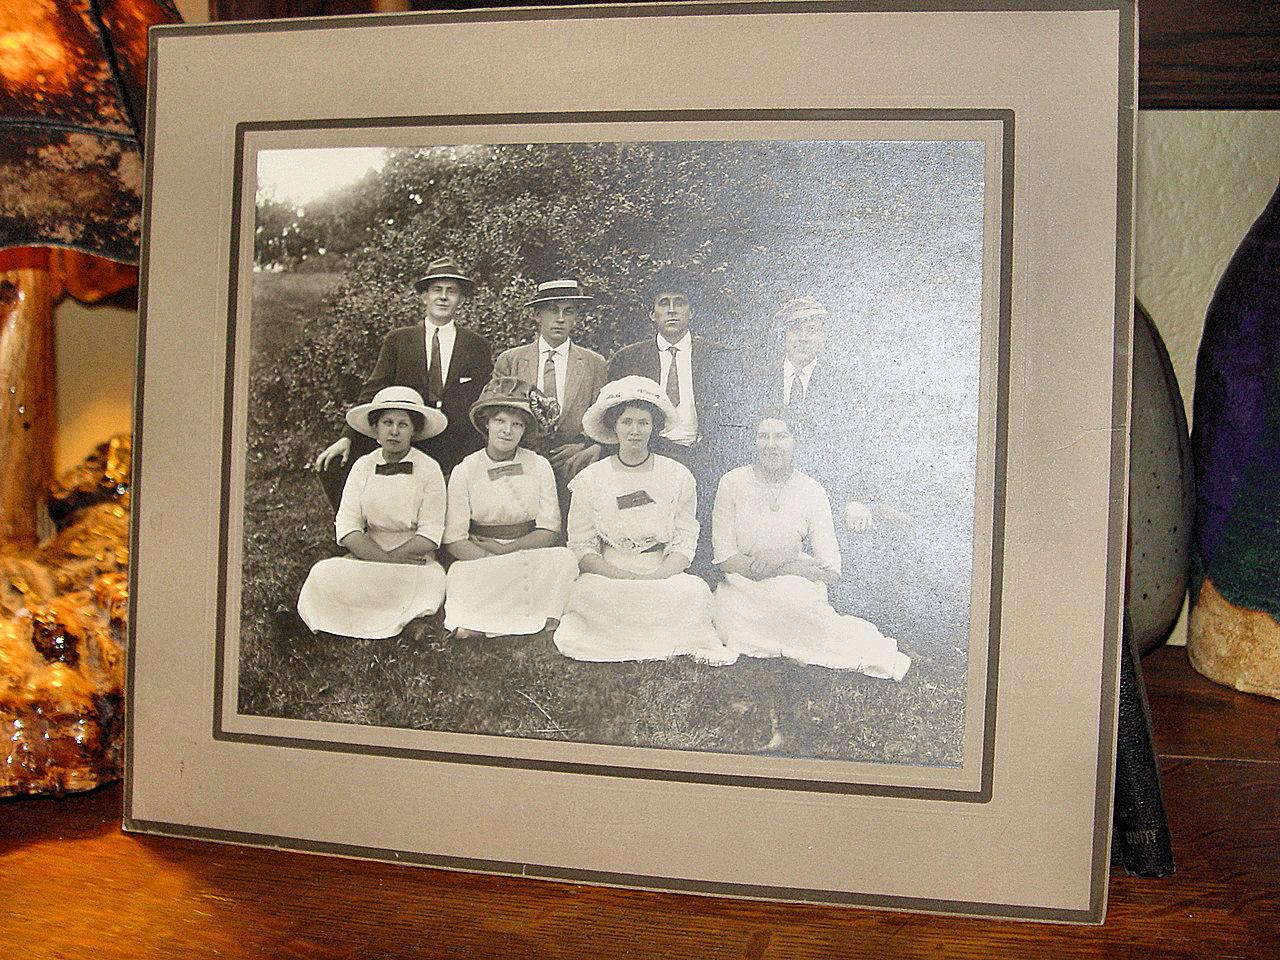 Carl                                                           Nordmark Lrg                                                           Cabinet                                                           Photograph                                                           Scandinavian                                                           Couples                                                           1911-1914